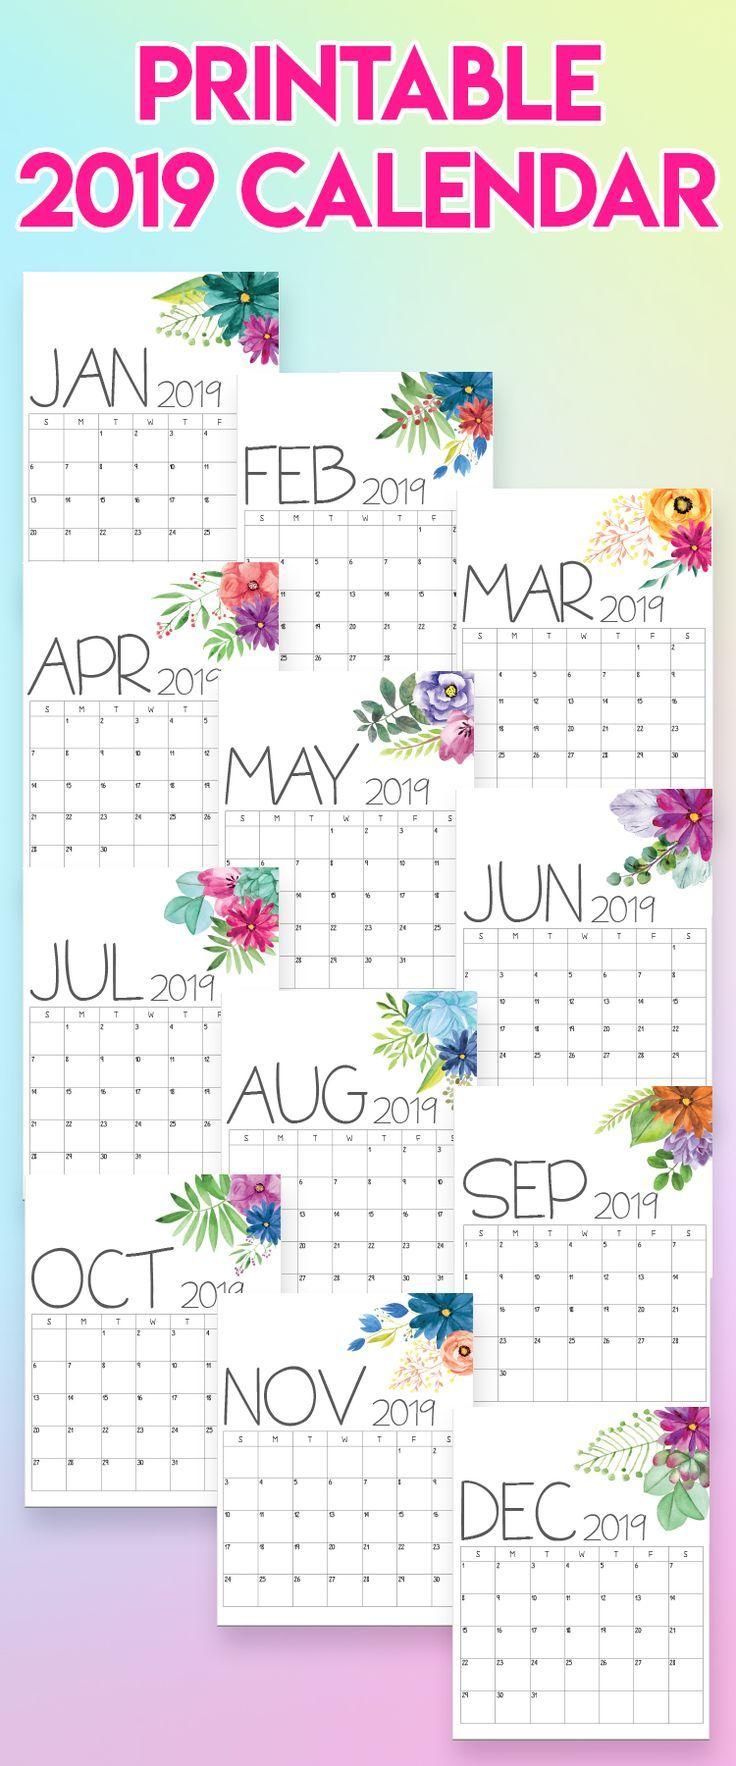 Emerald Print Shop Planner Calendar Calendar Printables